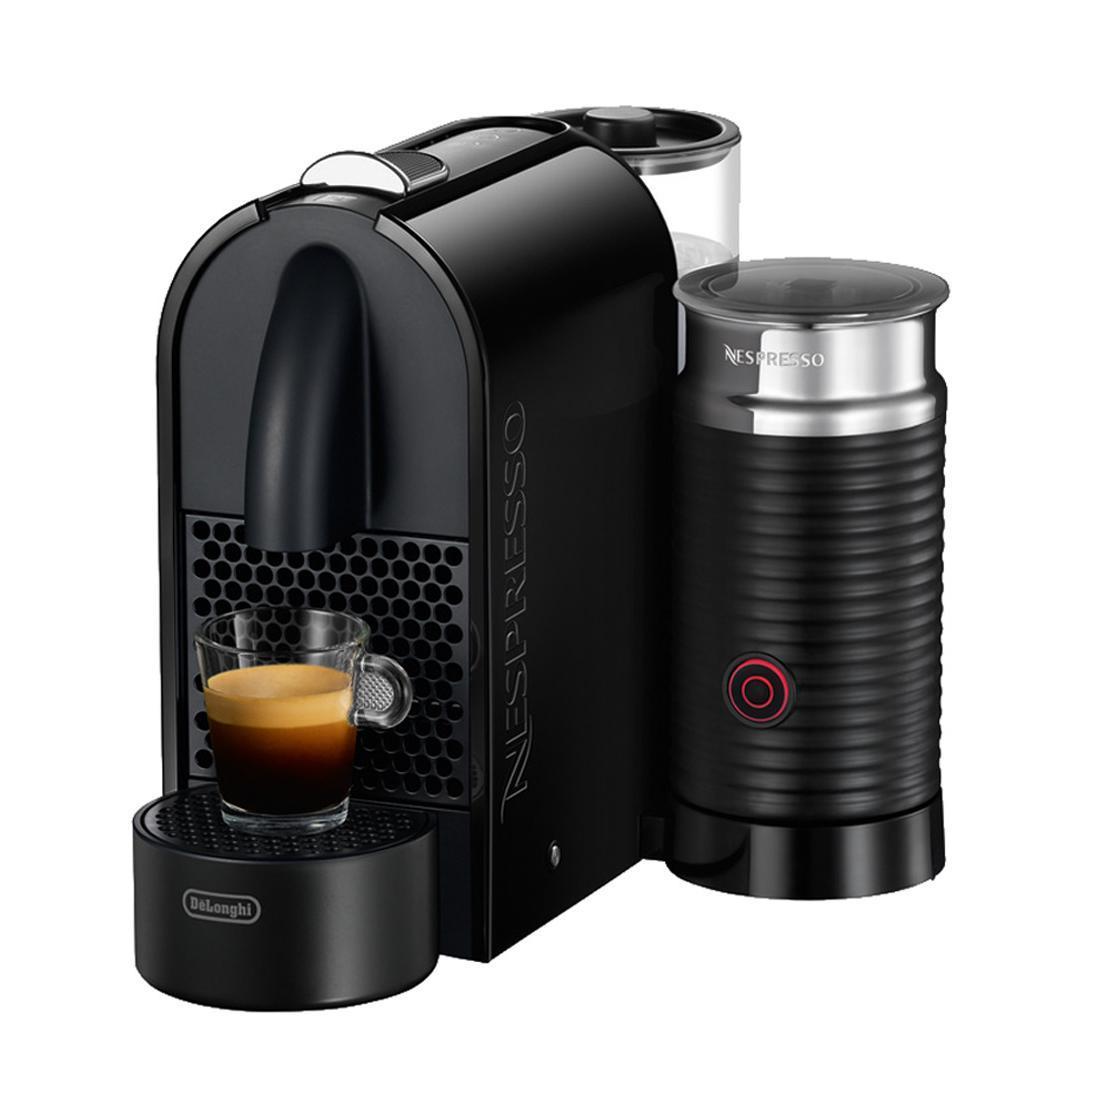 DeLonghi EN 210.BAE Nespresso кофеварка delonghi fh 1394 white